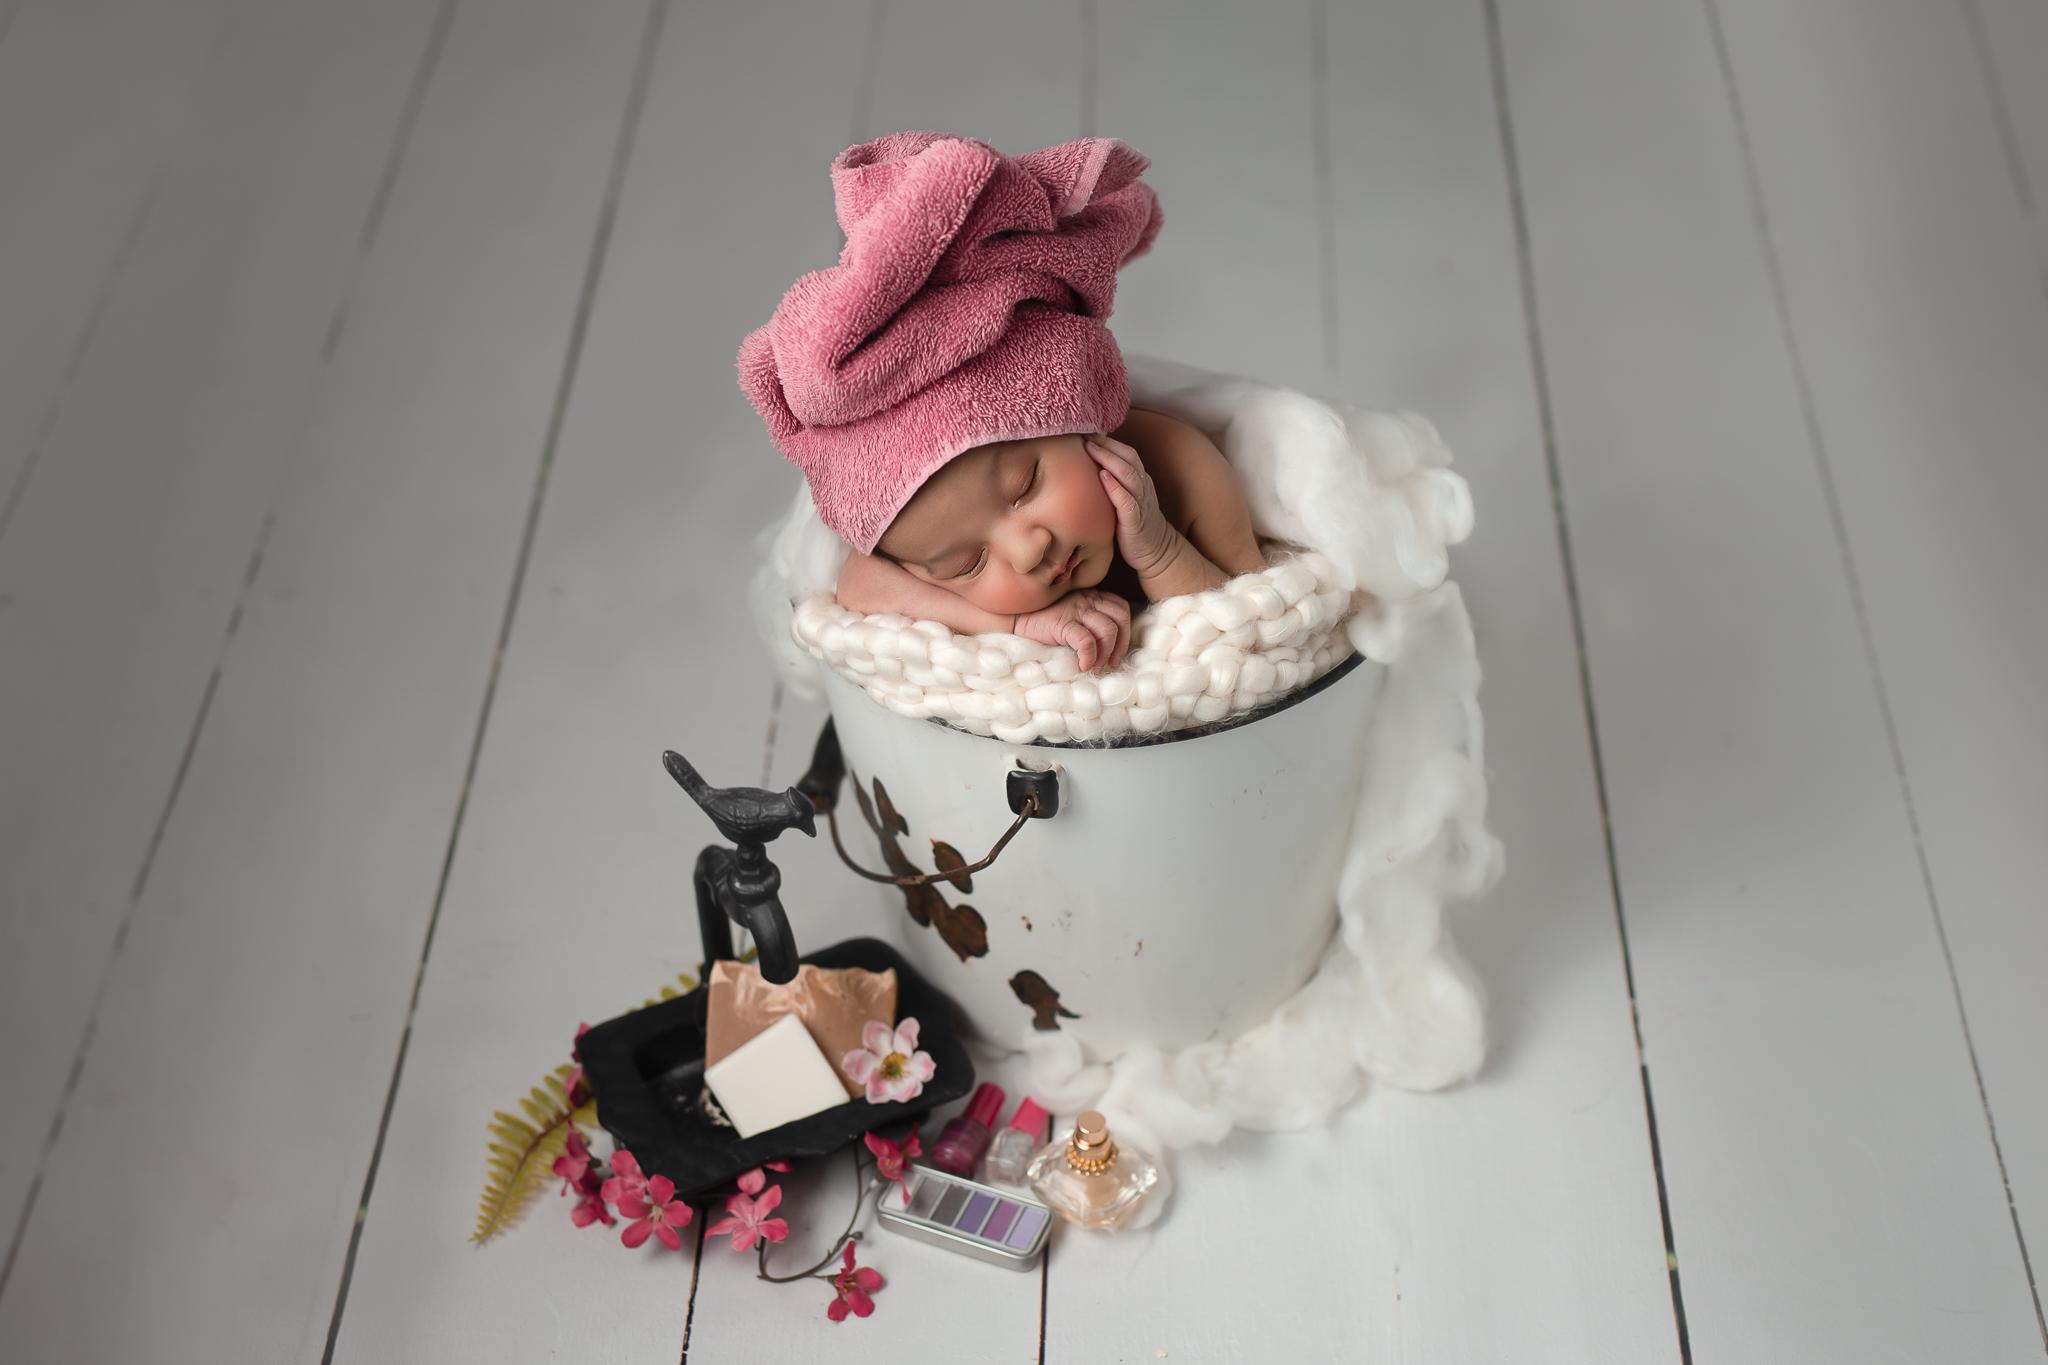 Newborn68NaomiLuciennePhotography032019-2-Edits.jpg